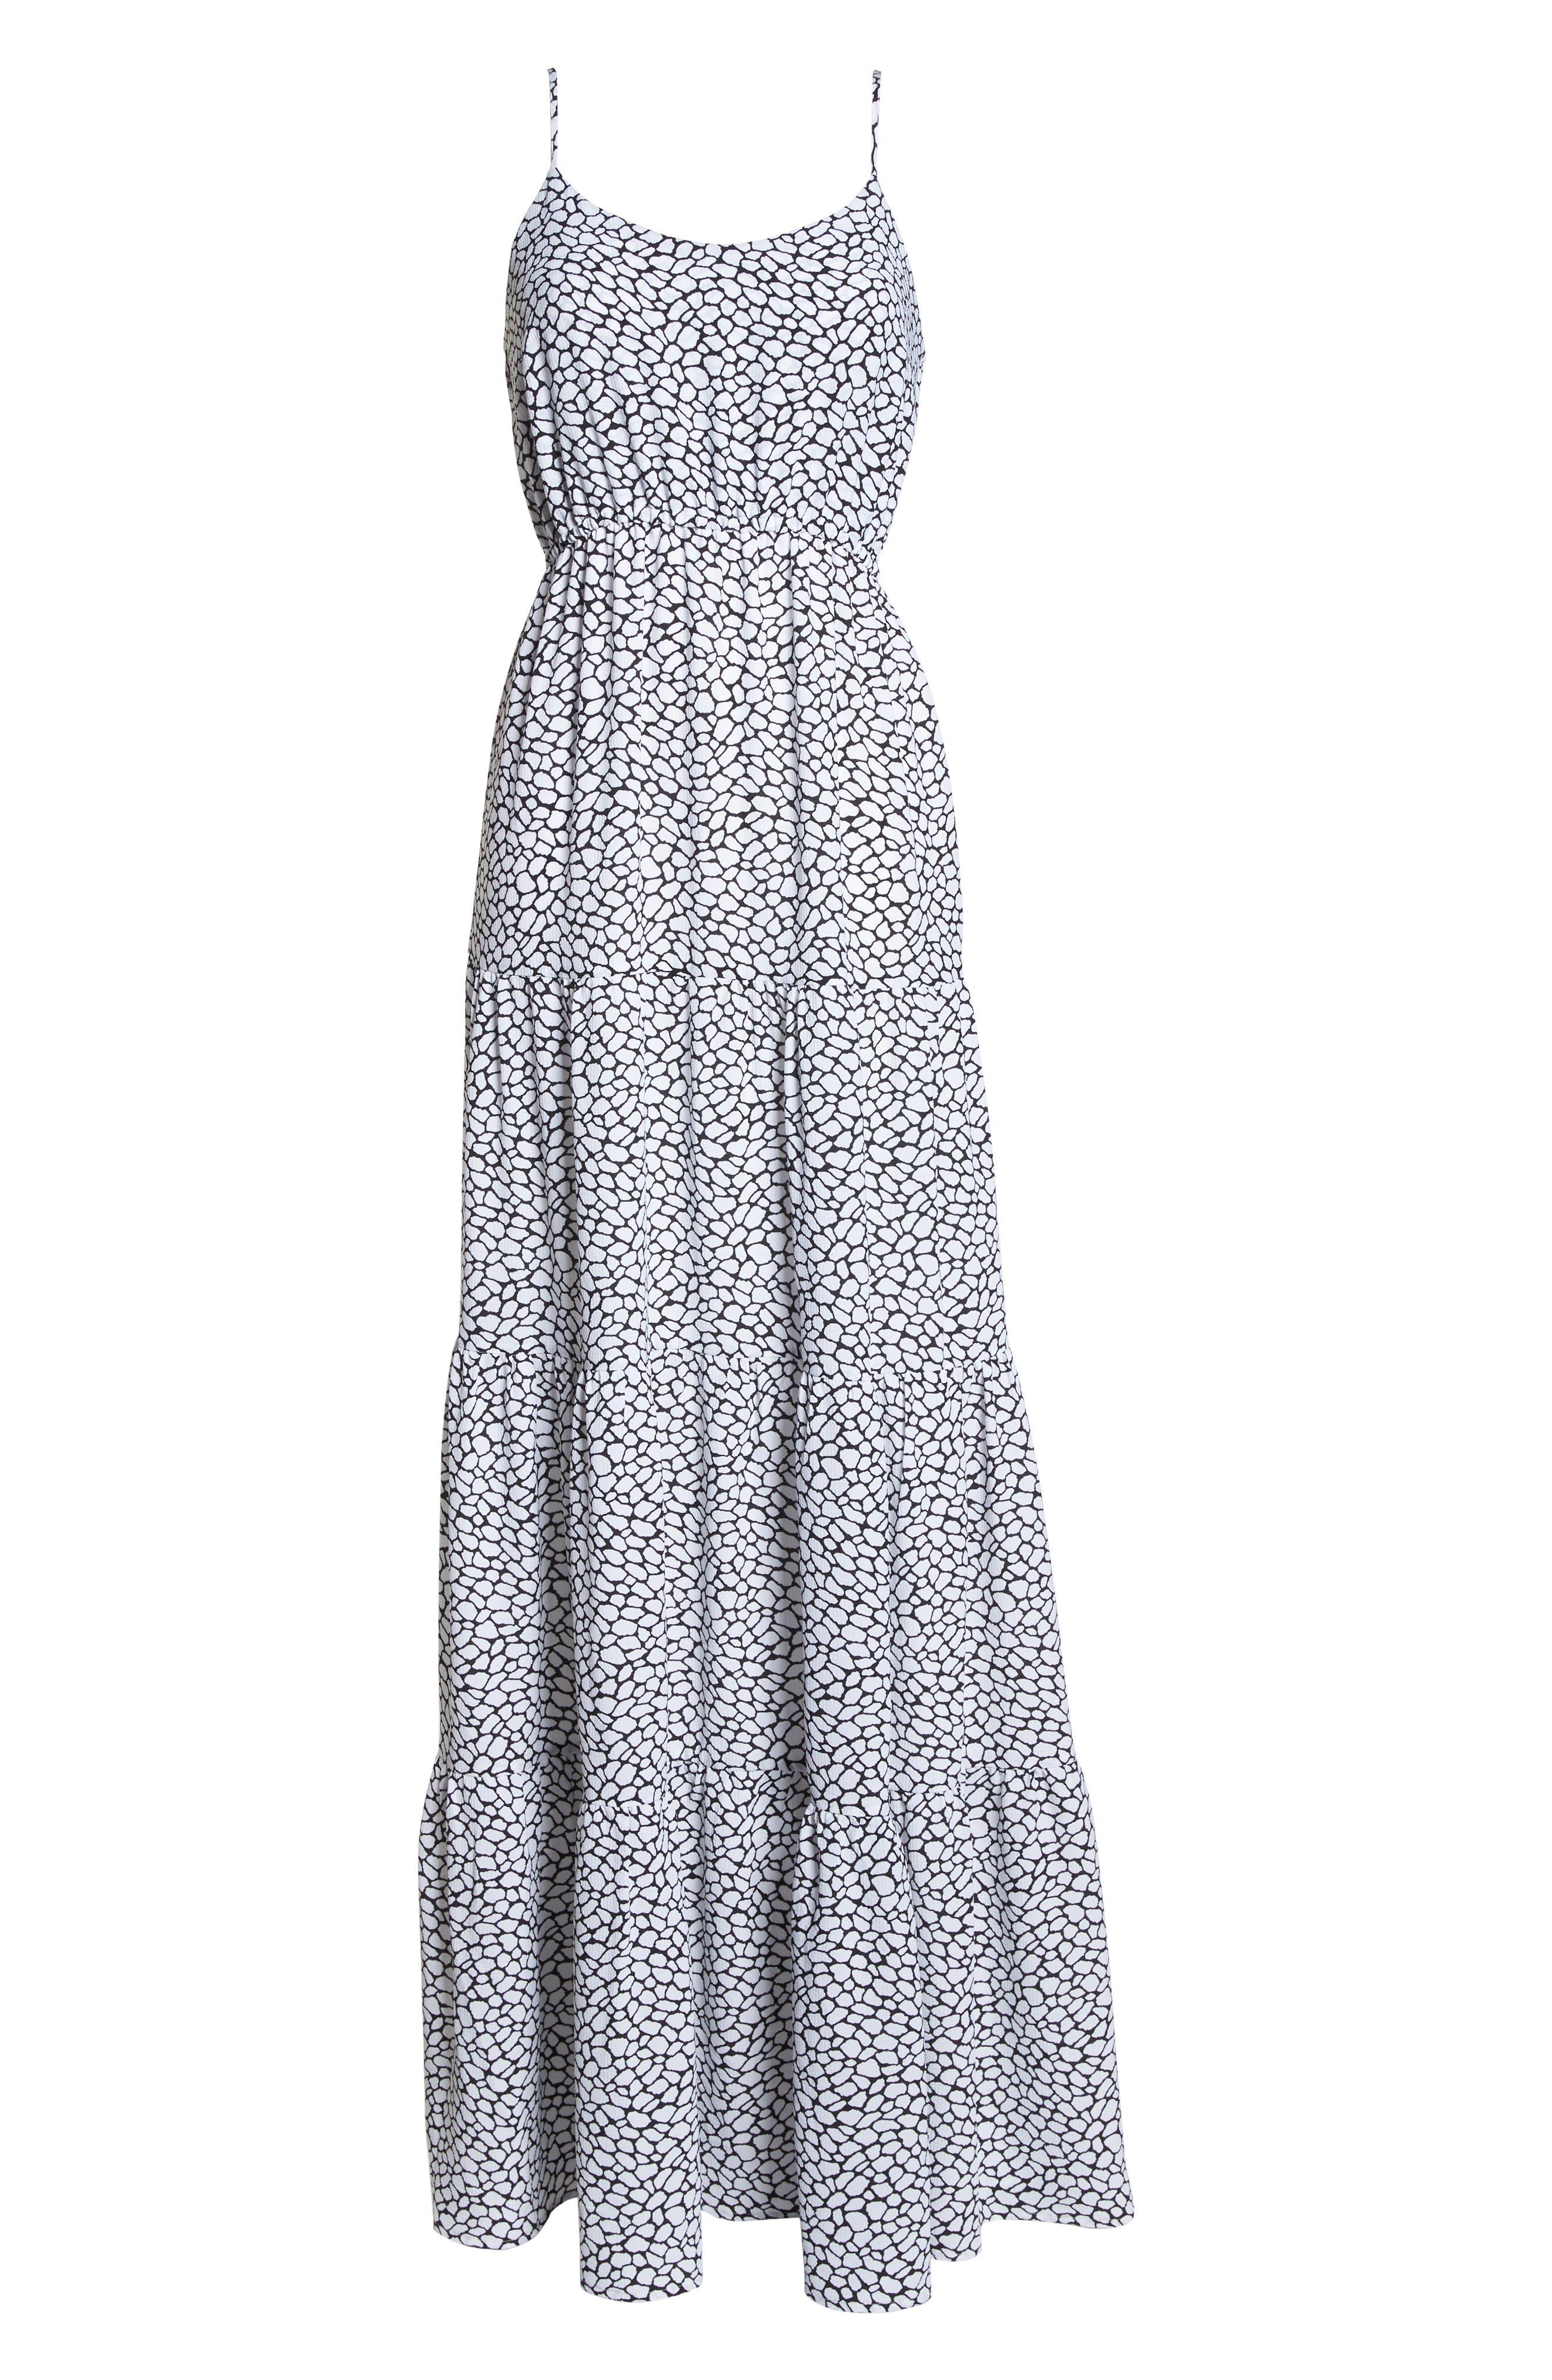 Tiered Maxi Dress,                             Alternate thumbnail 7, color,                             White/ Black